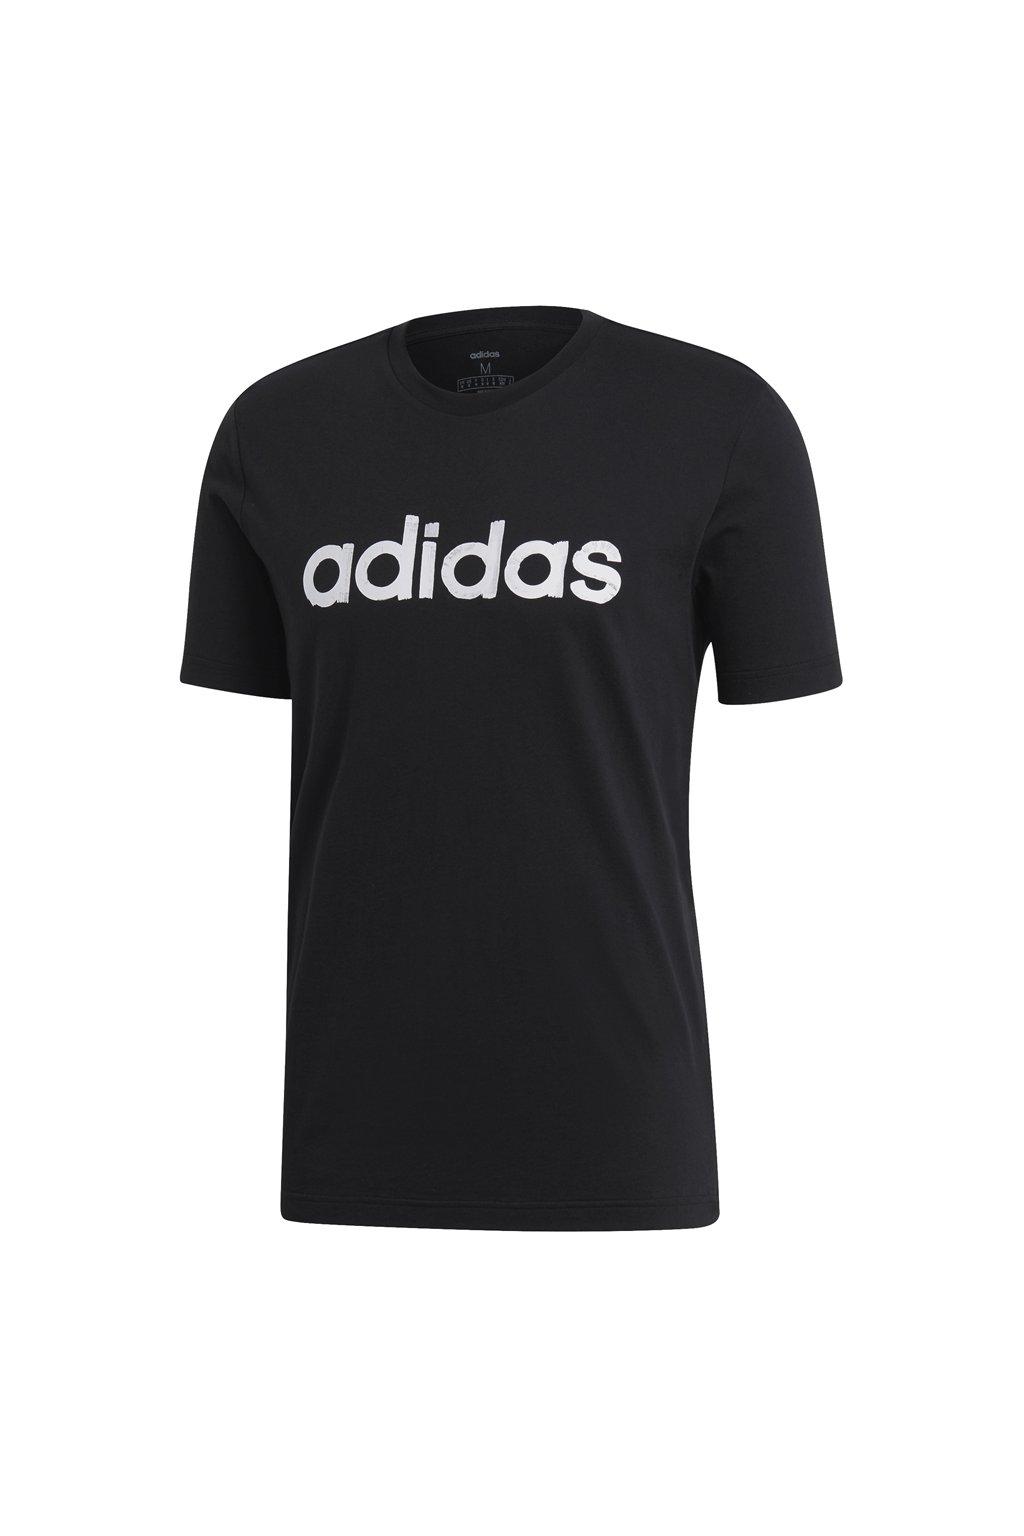 Pánske tričko Adidas M Graphic Linear Tee 3, čierne EI4599